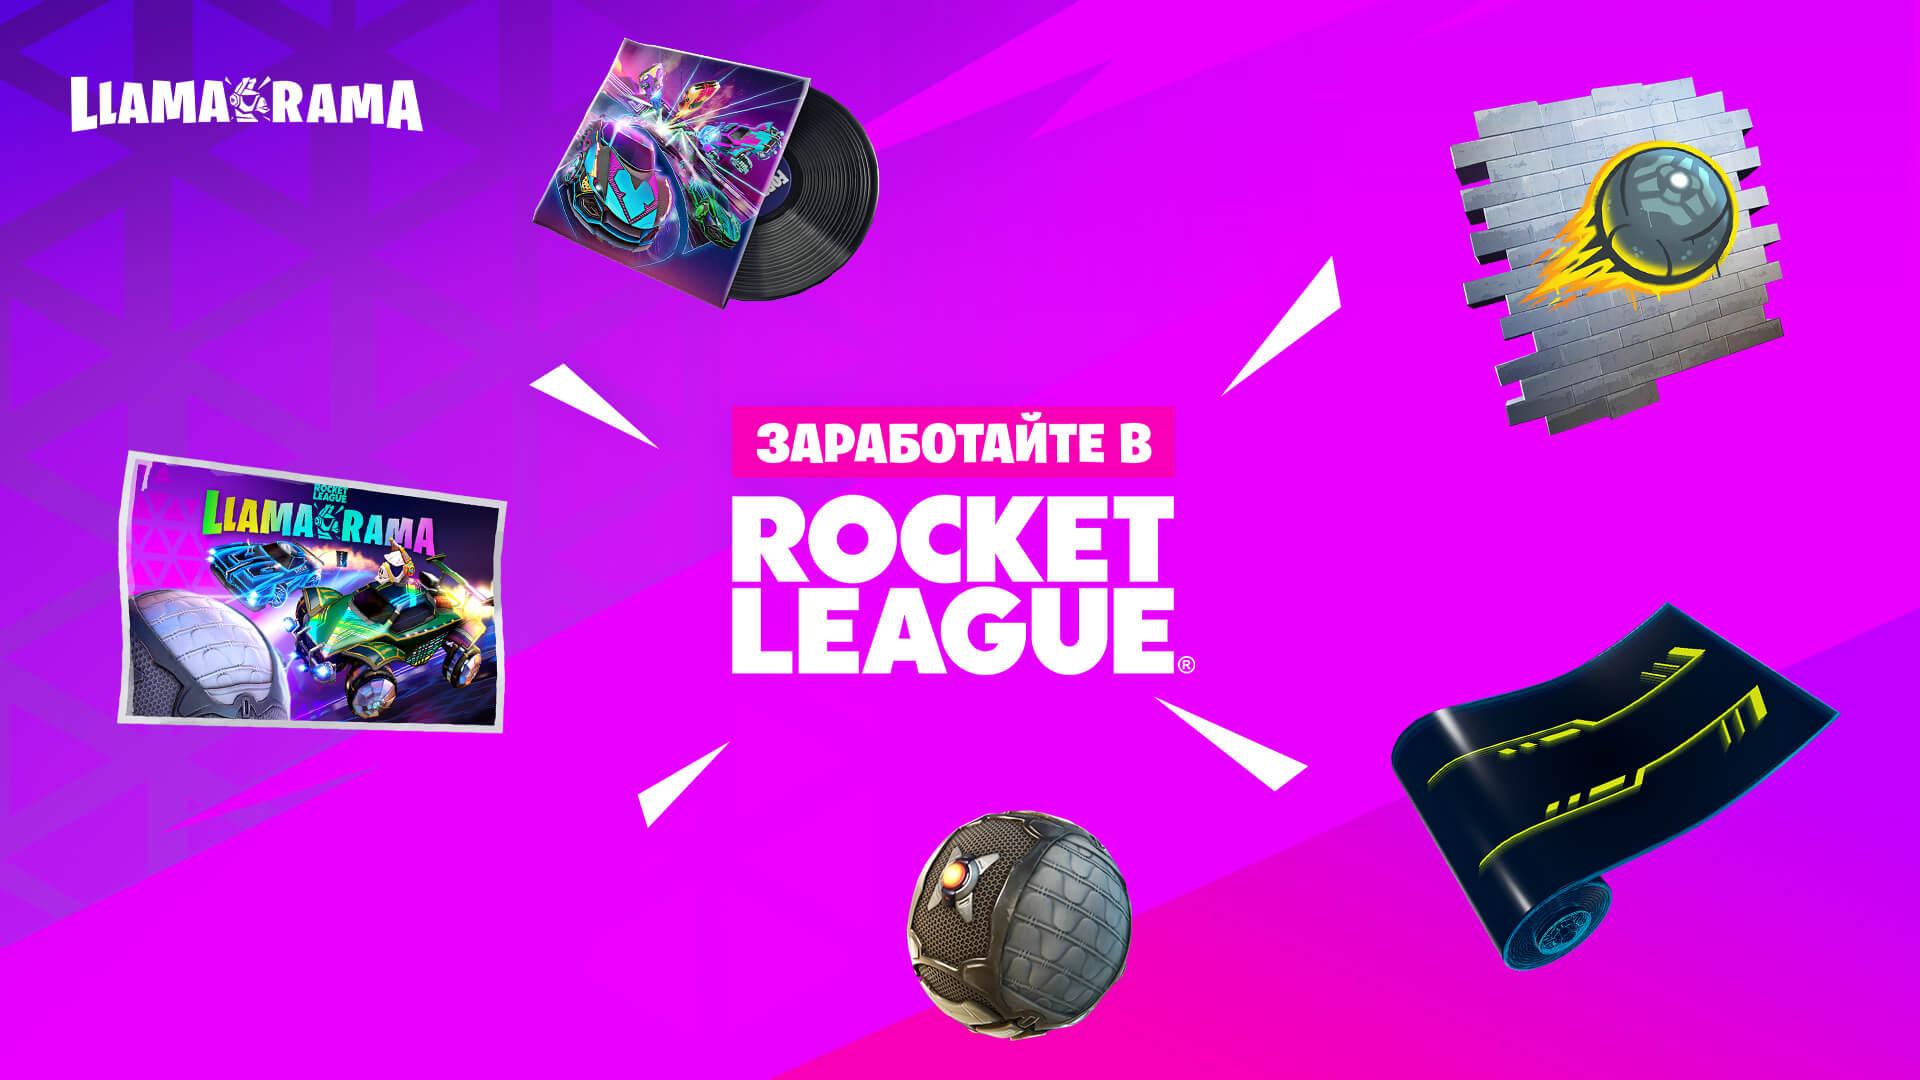 RU 16BR RocketLeague Llama Rama Rewards V2 Social